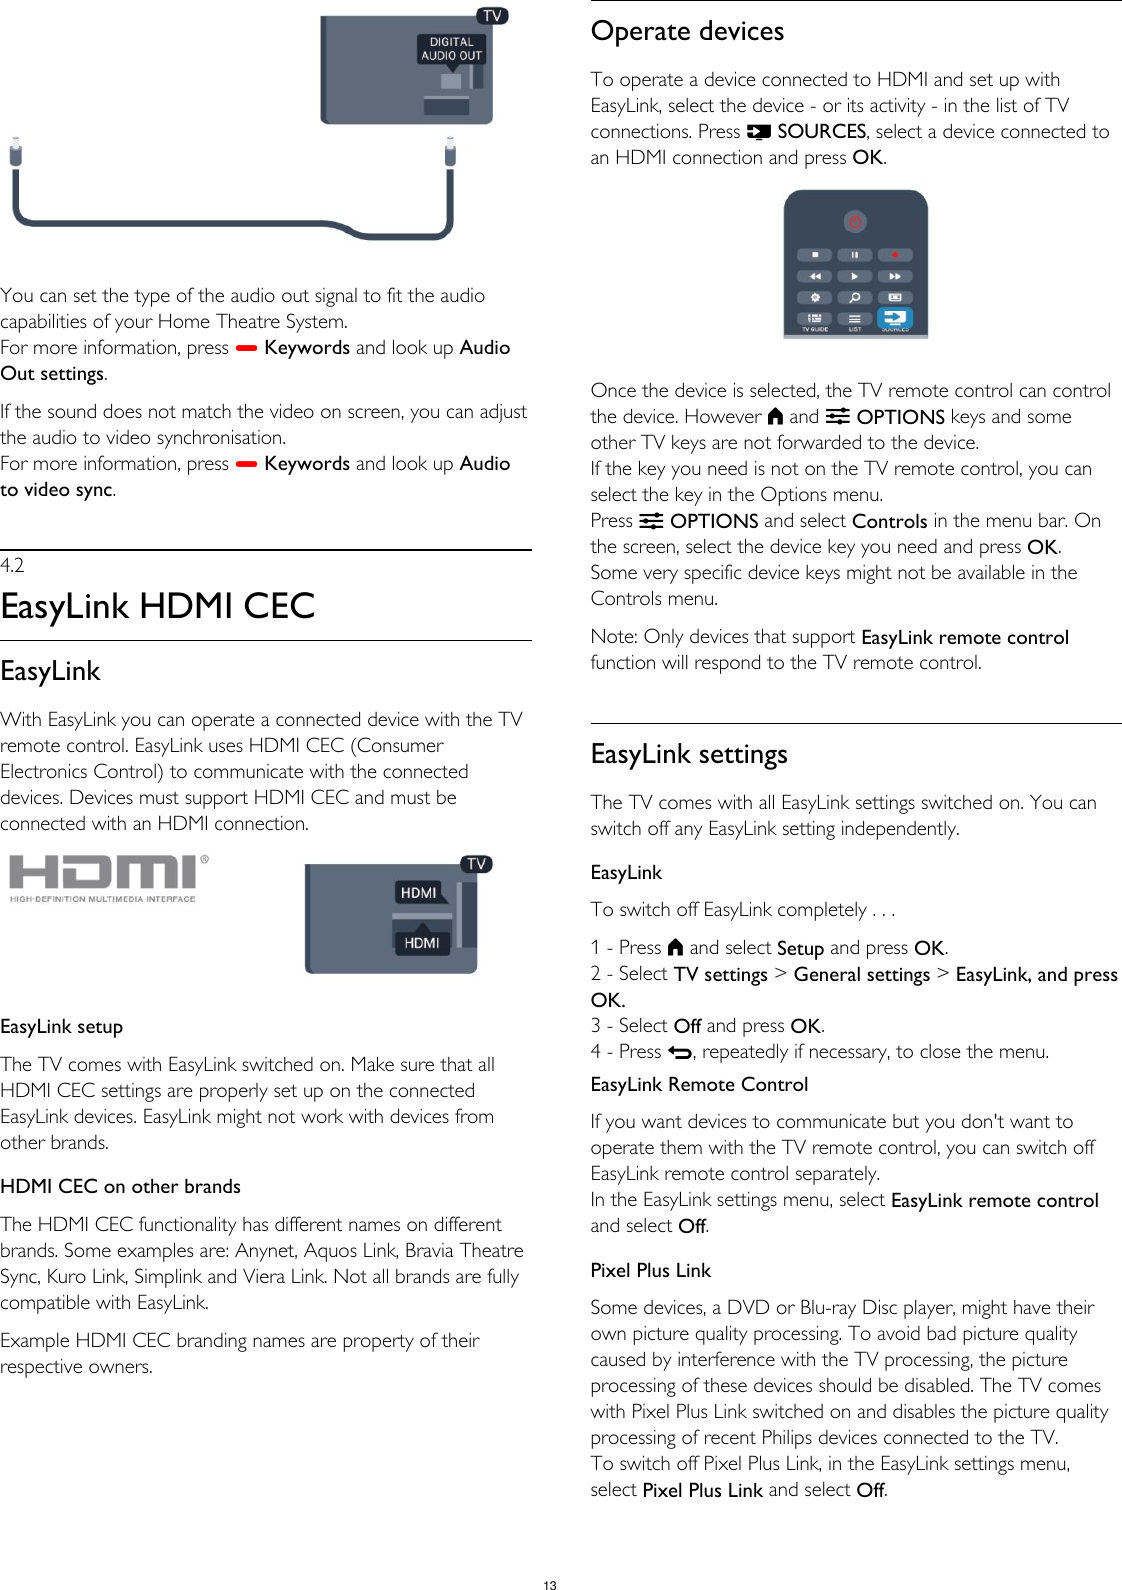 Philips 50PFT4509/12 User Manual 50pft4509 12 Dfu Eng